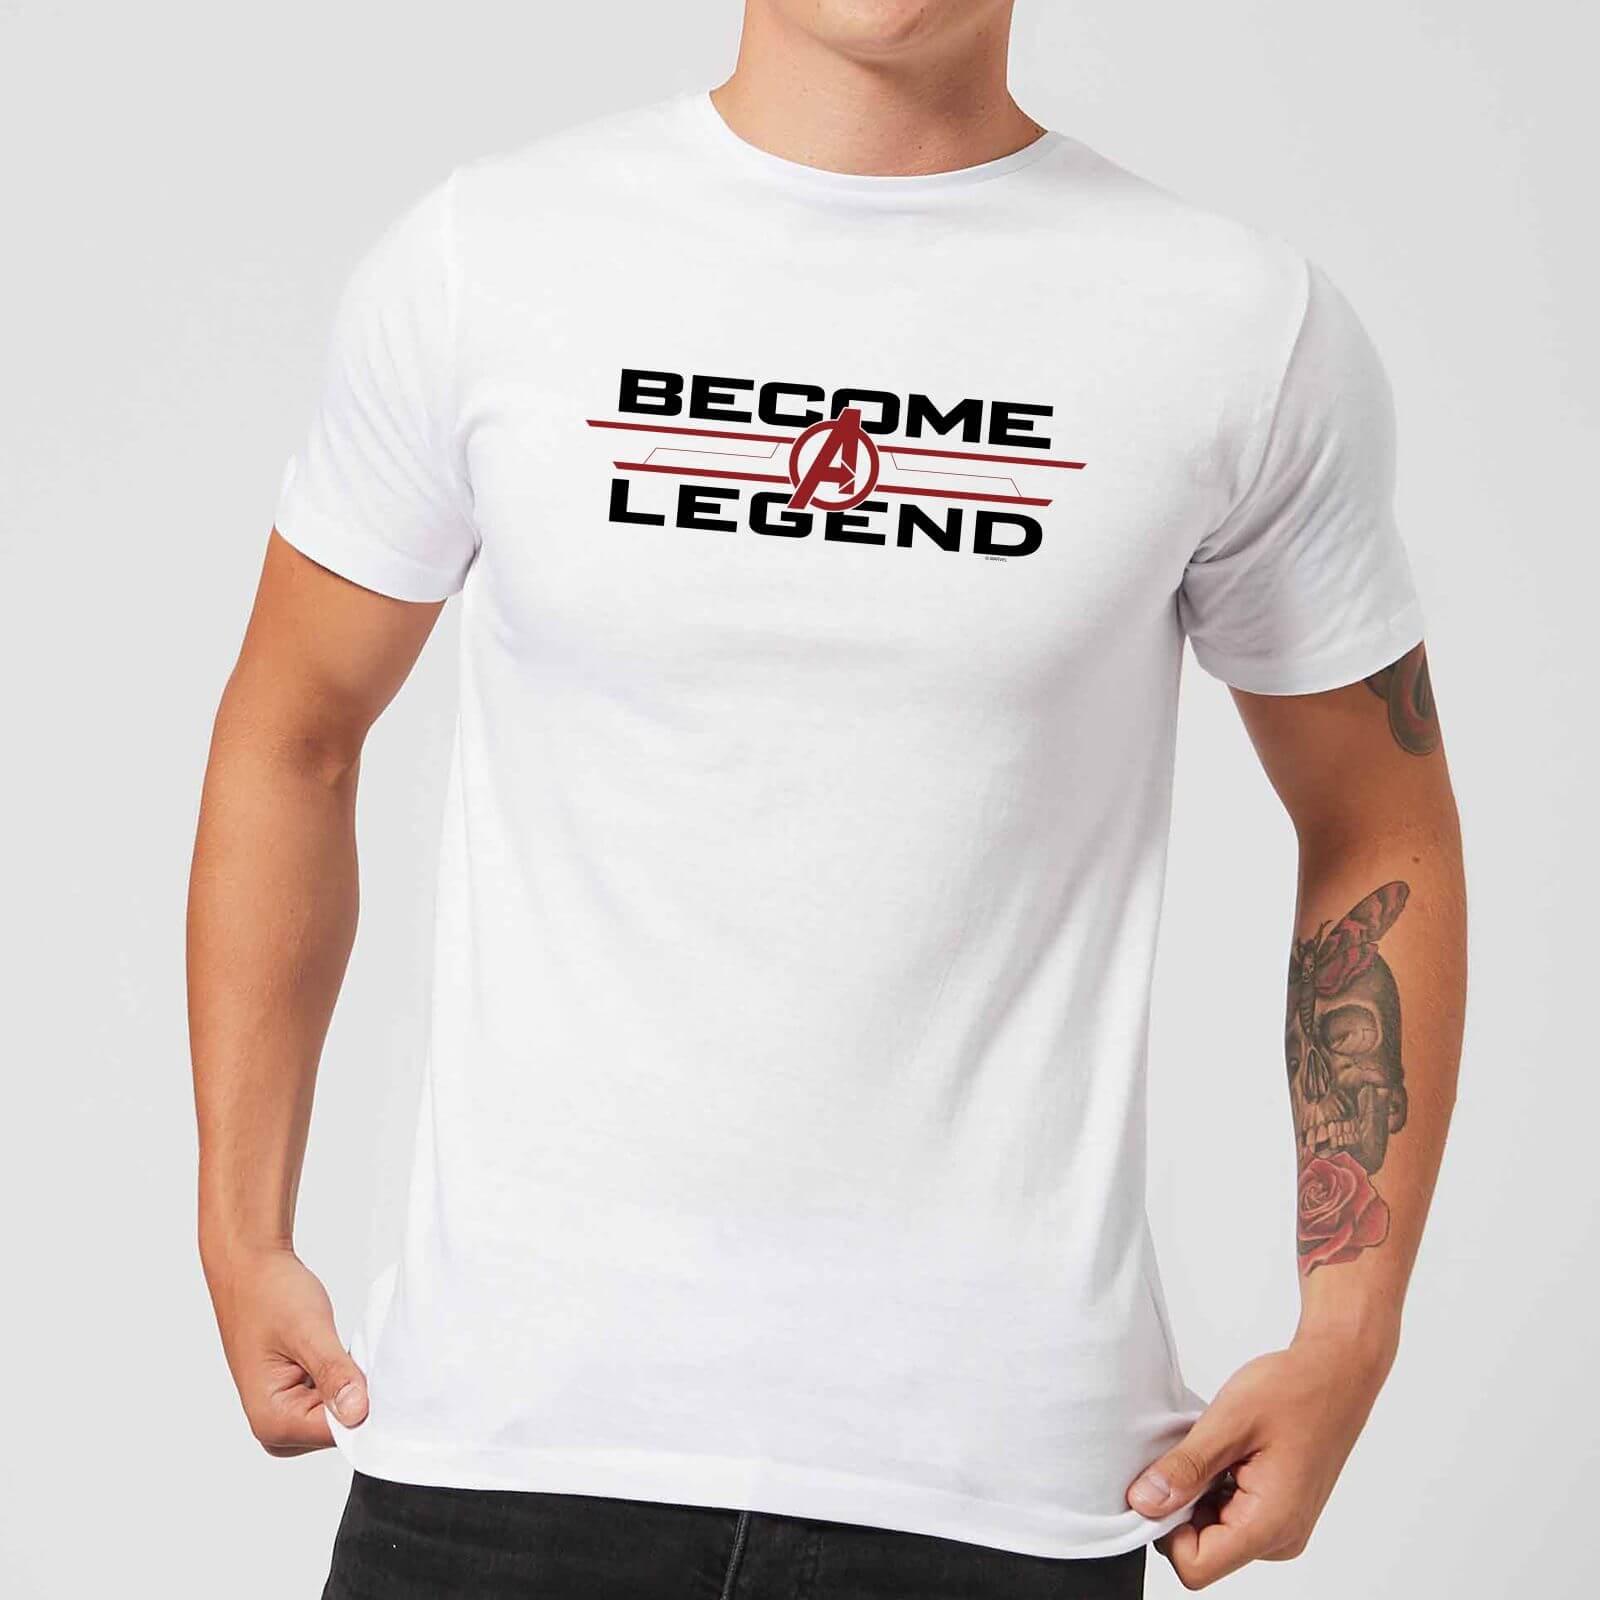 new design shop for luxury clear-cut texture Avengers Endgame Become A Legend Men's T-Shirt - White